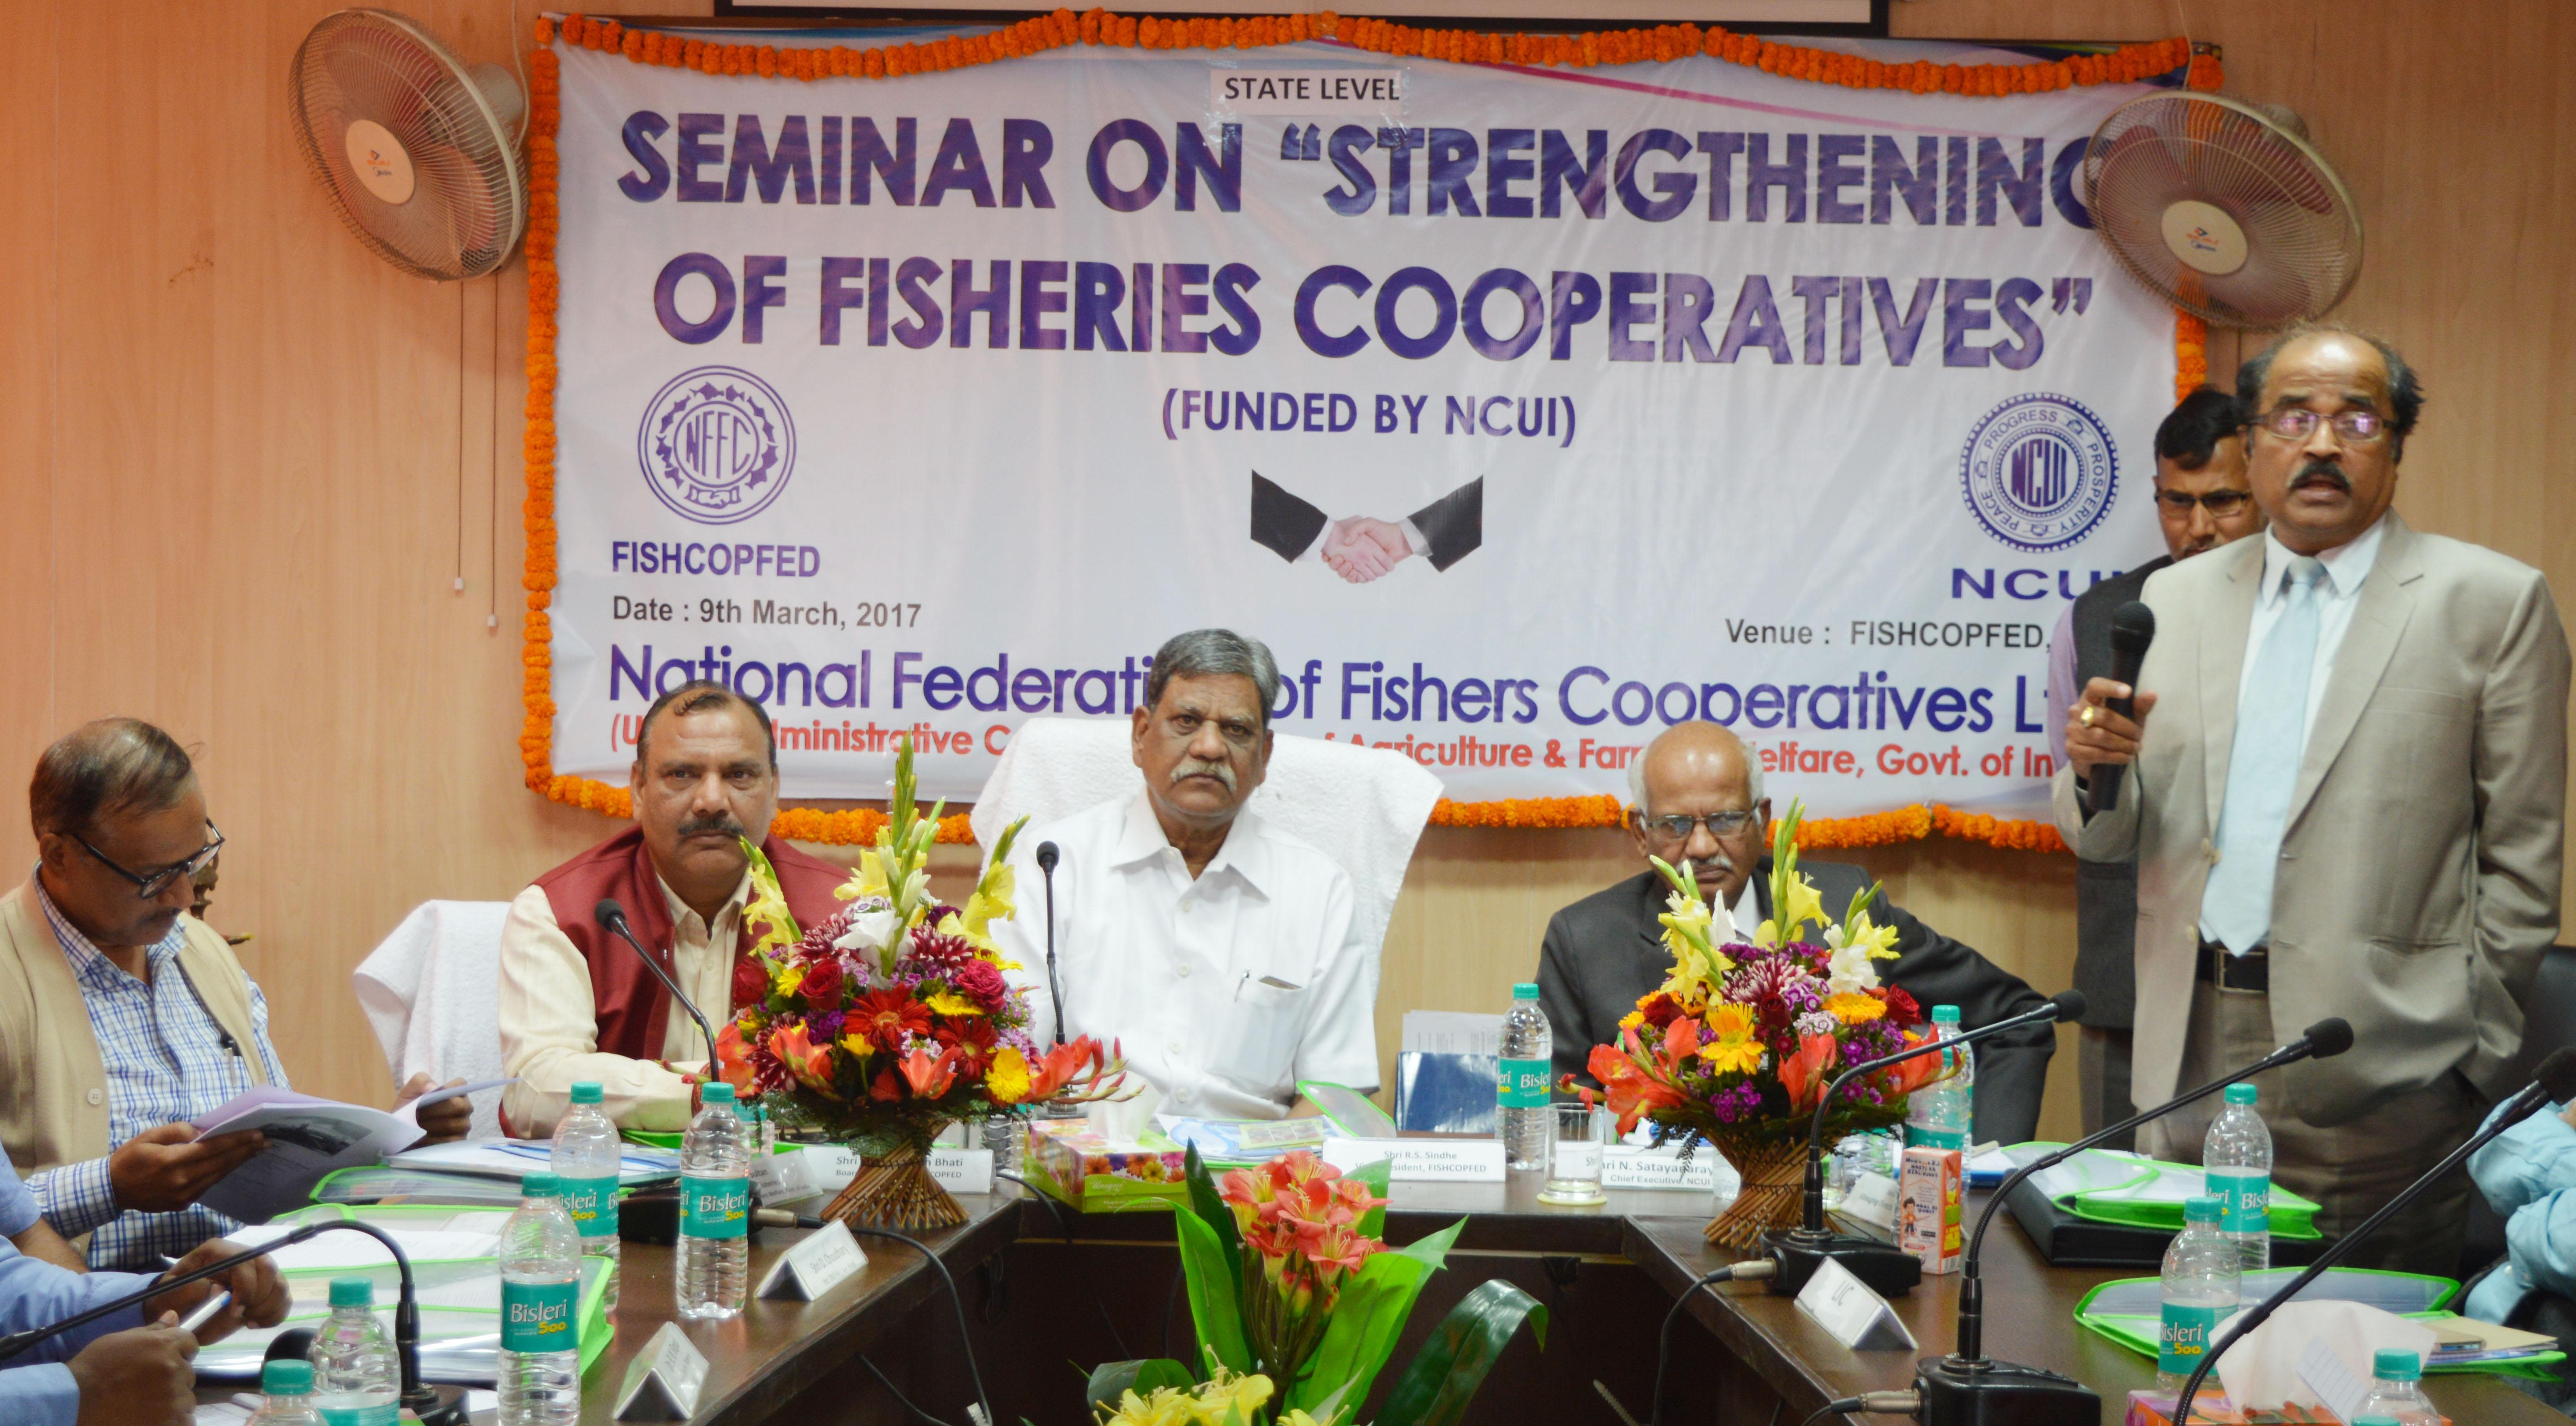 Fishcopfed is part of Blue Revolution: Govt